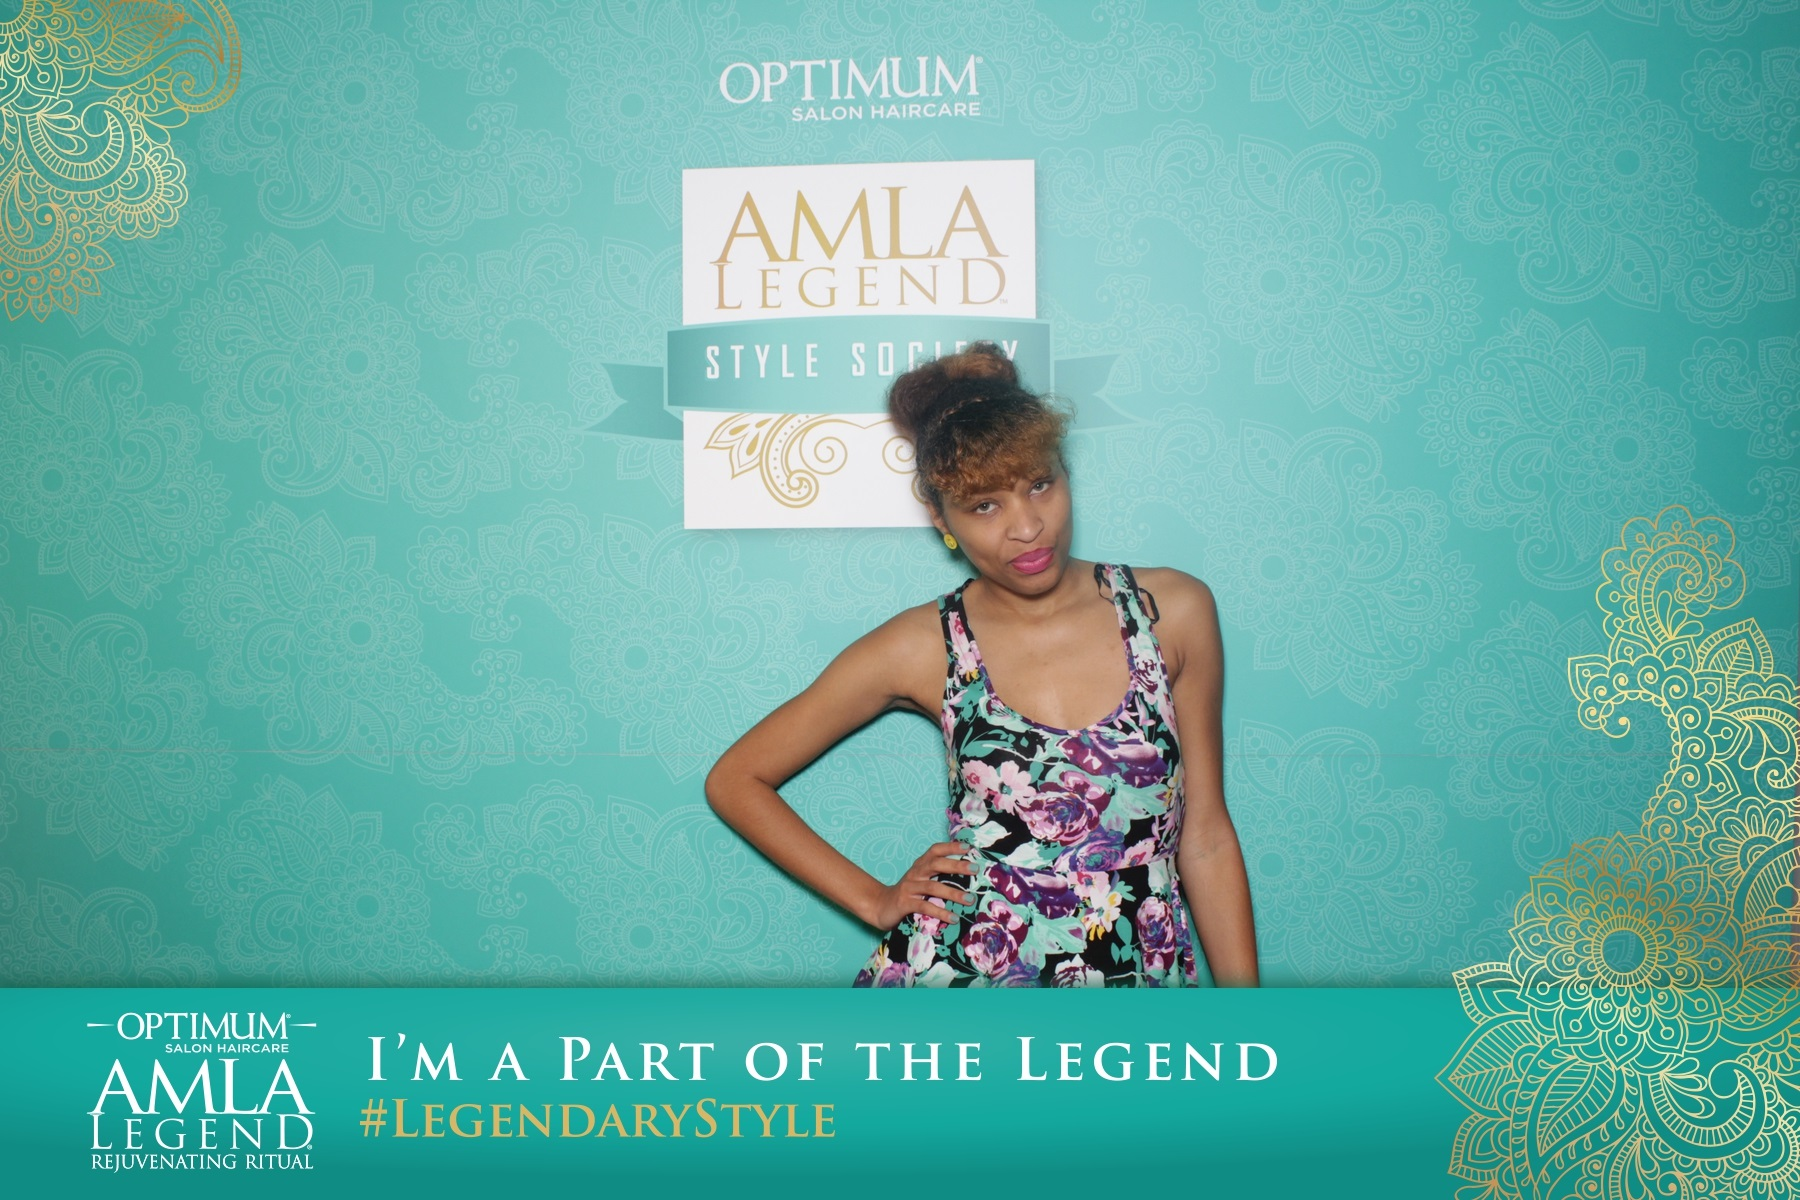 Legendary Style Soiree-Tracee-Ellis-Ross-optimium-Alma-Legend-kiwi-the-beauty-3